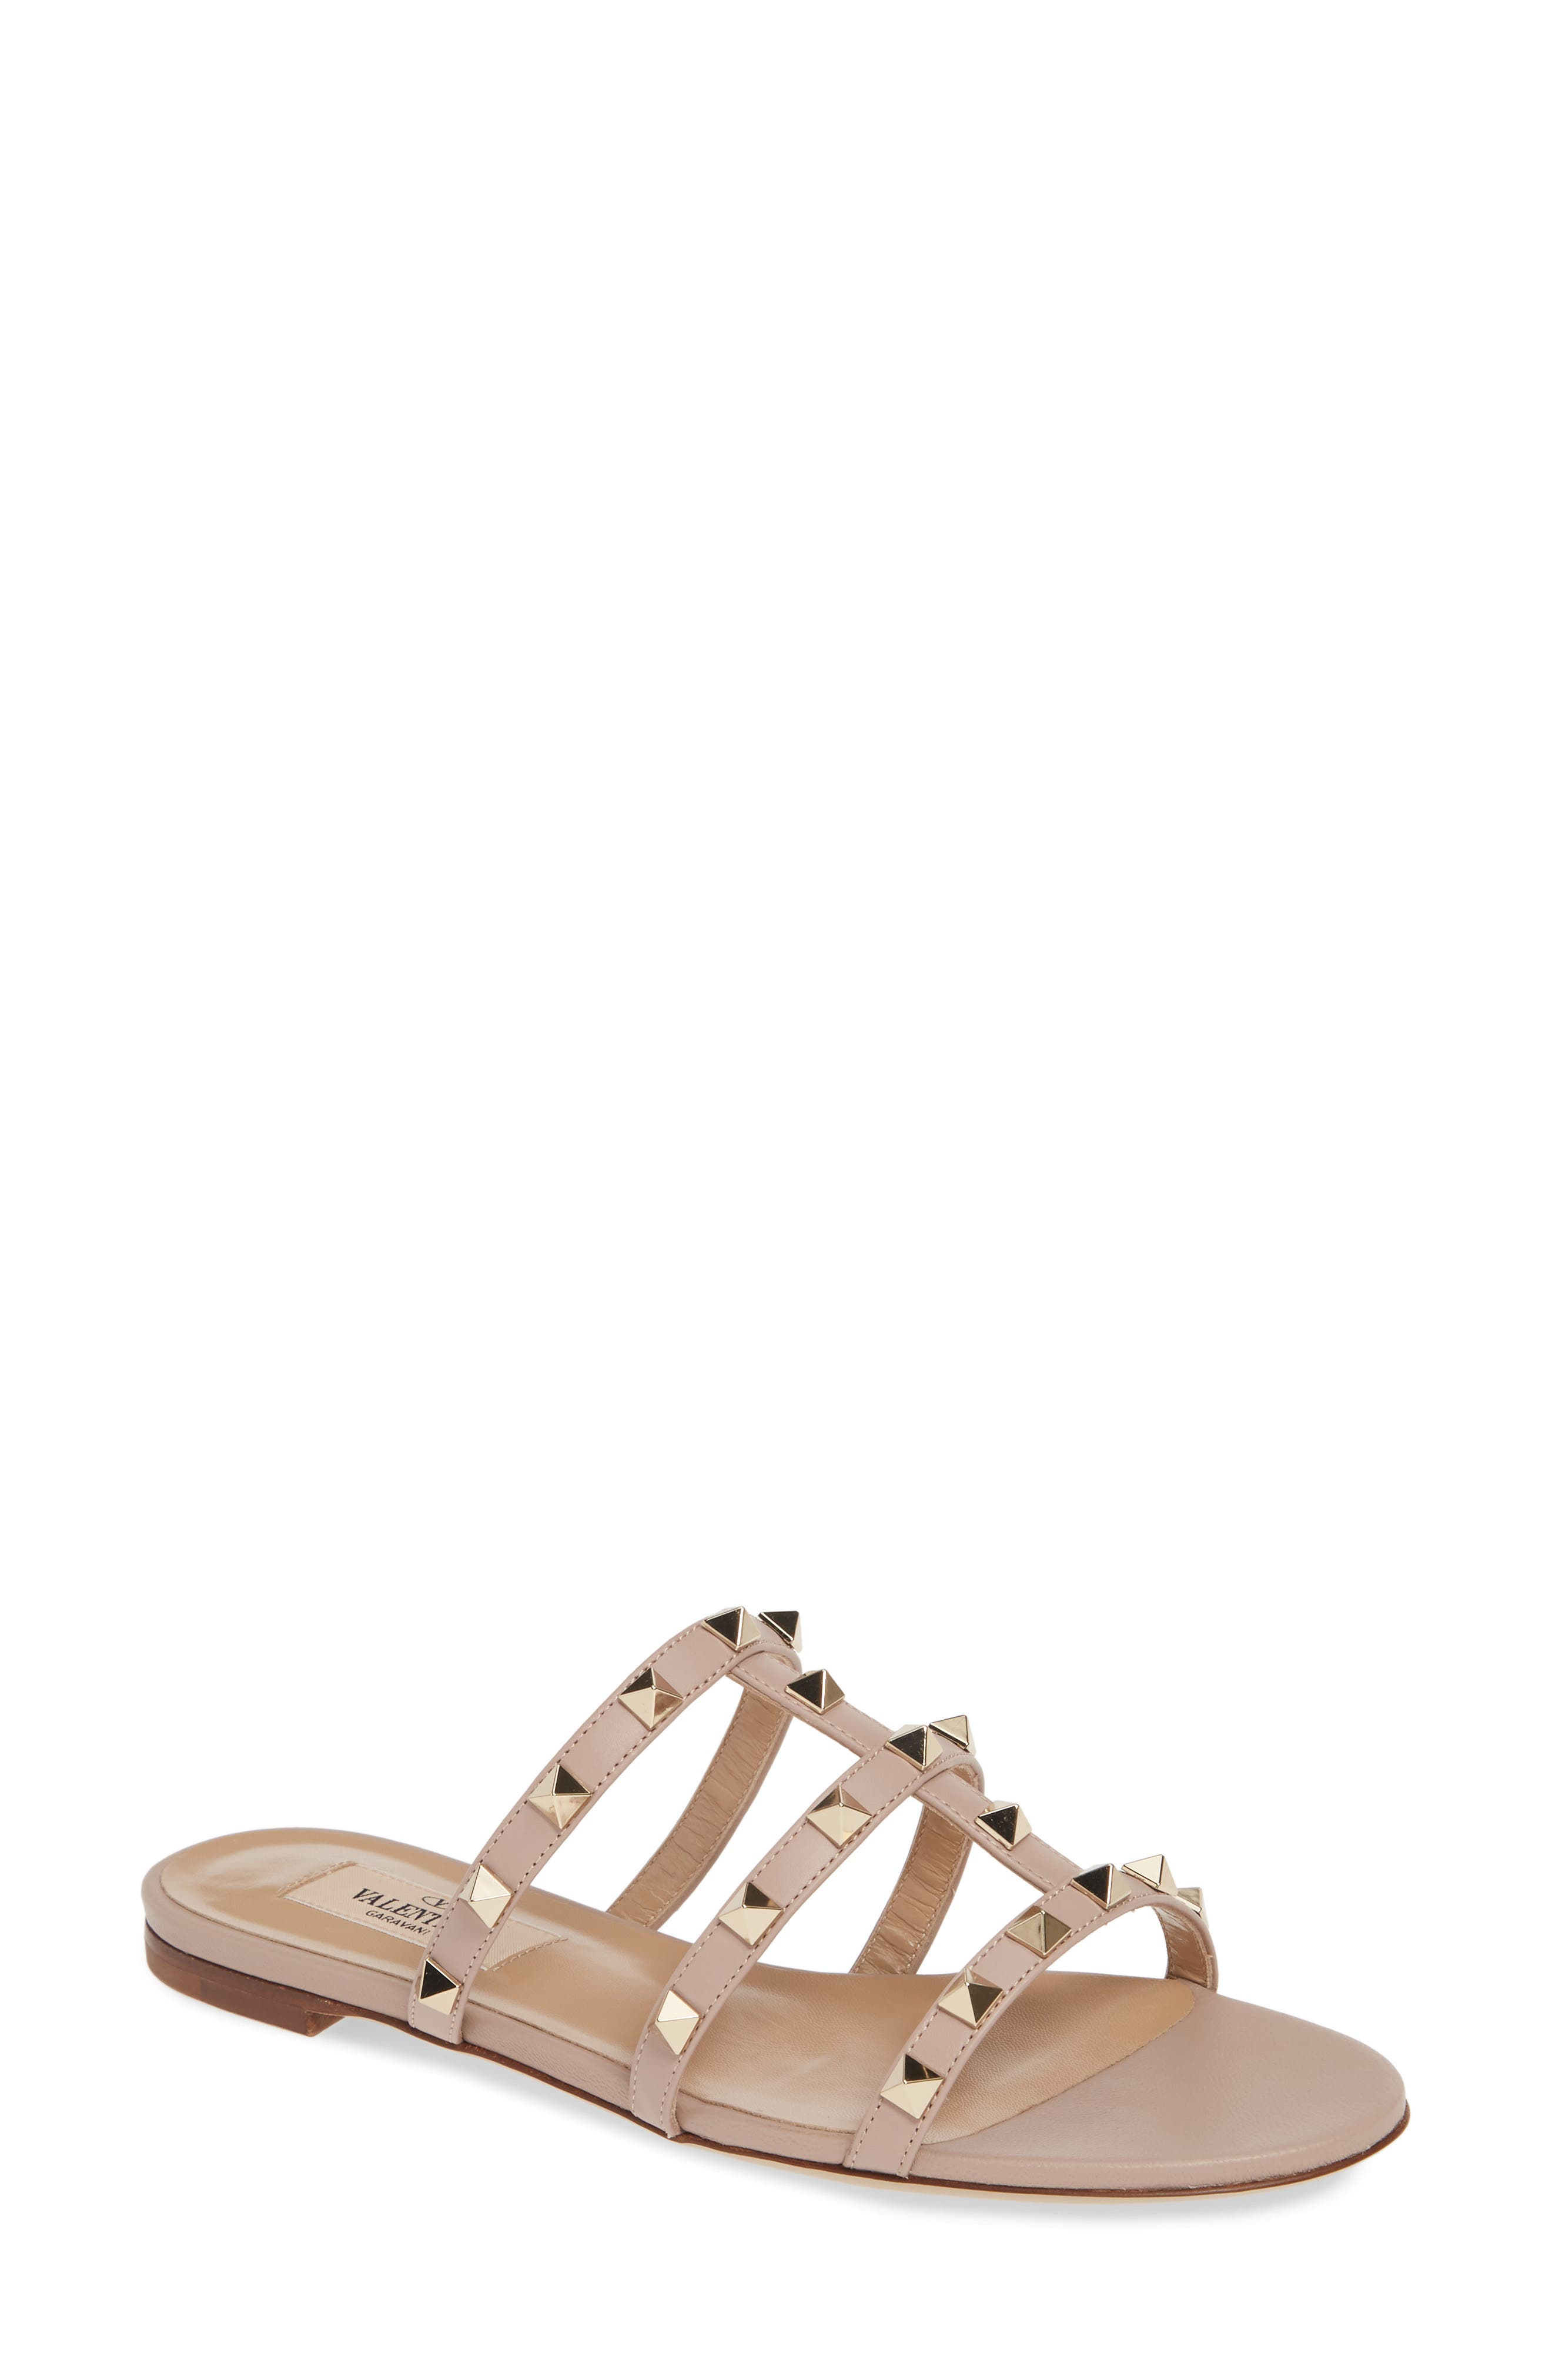 Women's Gladiator Sandals | Nordstrom